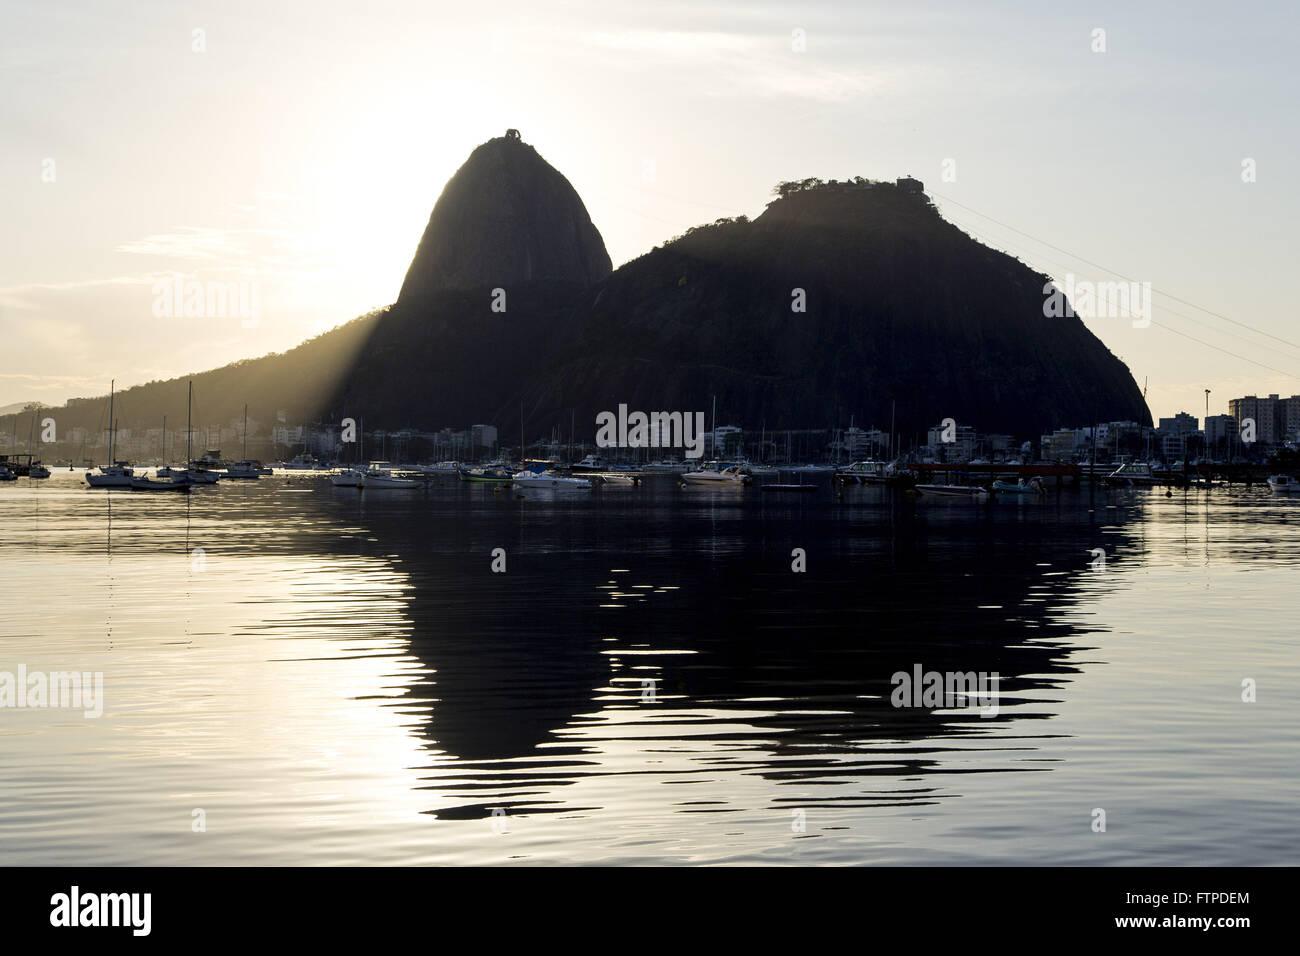 Dawn in Botafogo Bay with Morro do Pao de Acucar and Morro da Urca in the background Stock Photo